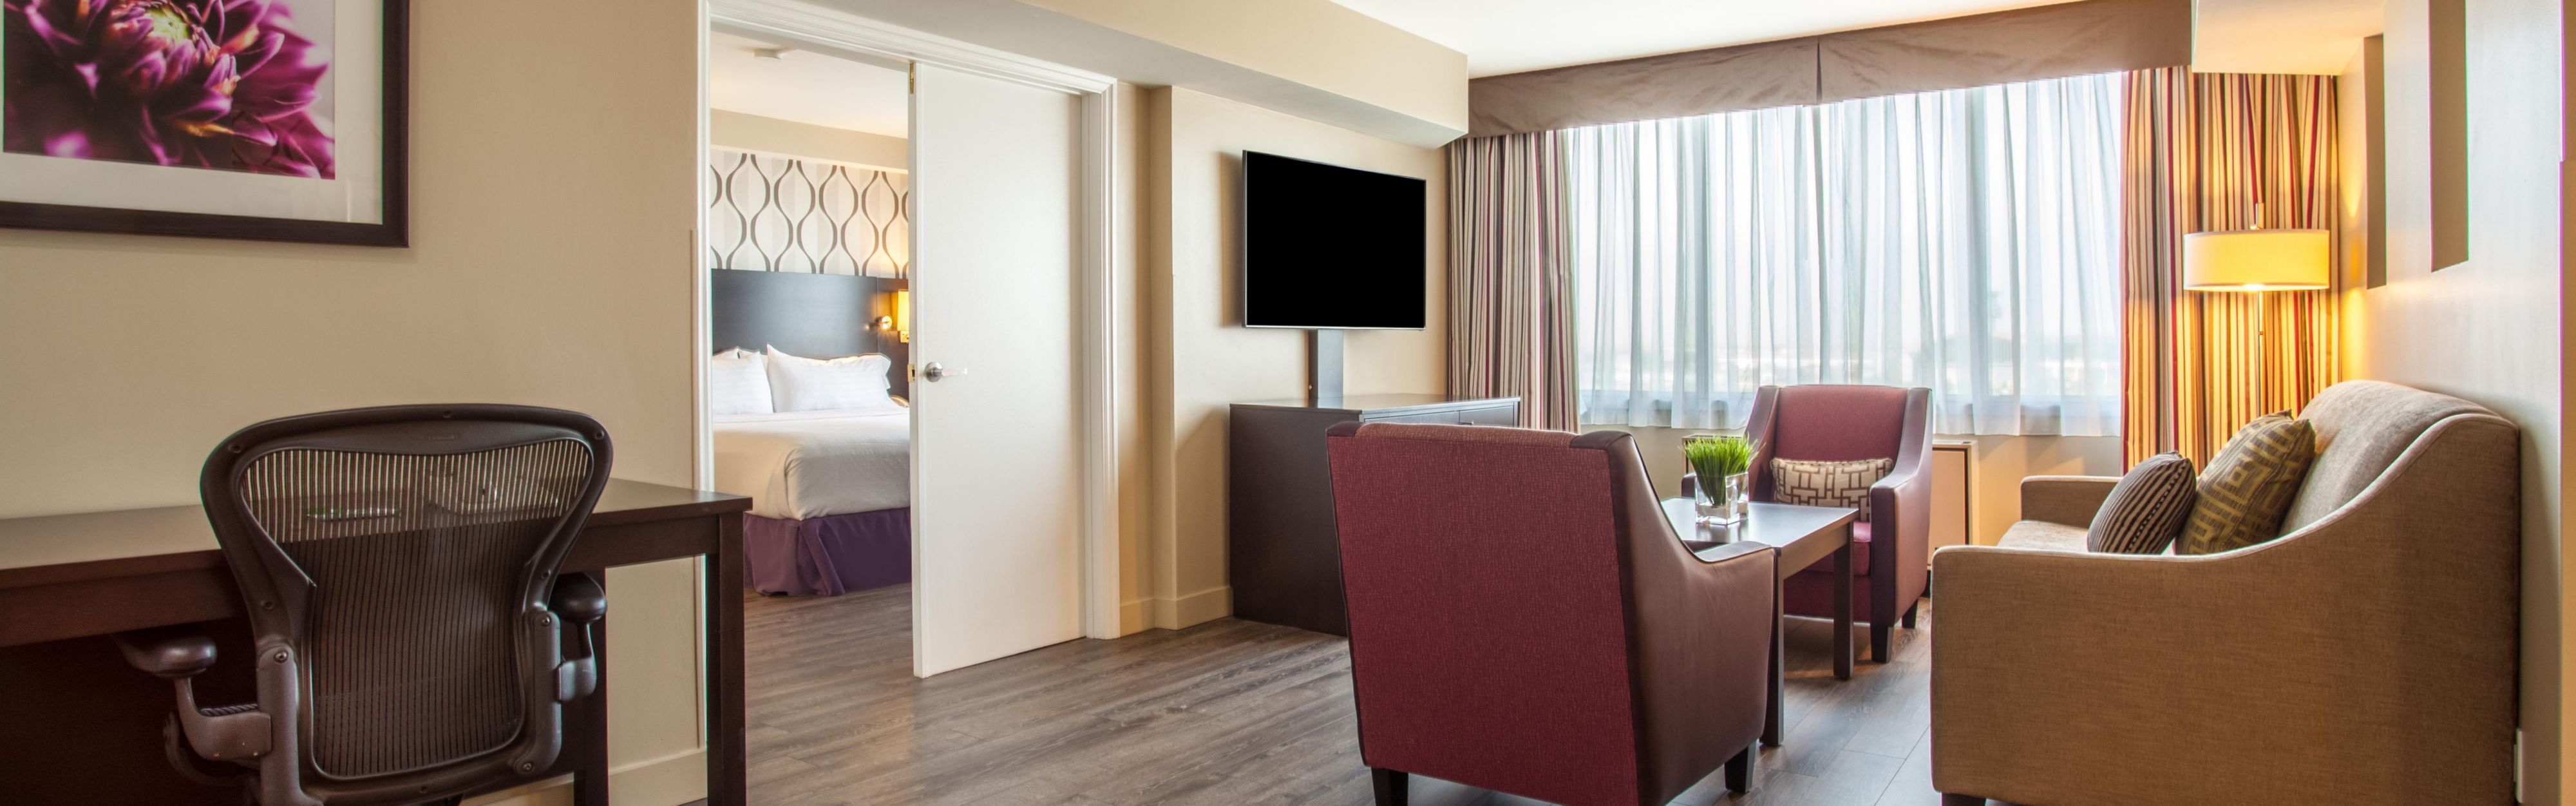 Holiday Inn Toronto International Airport Hotel By IHG